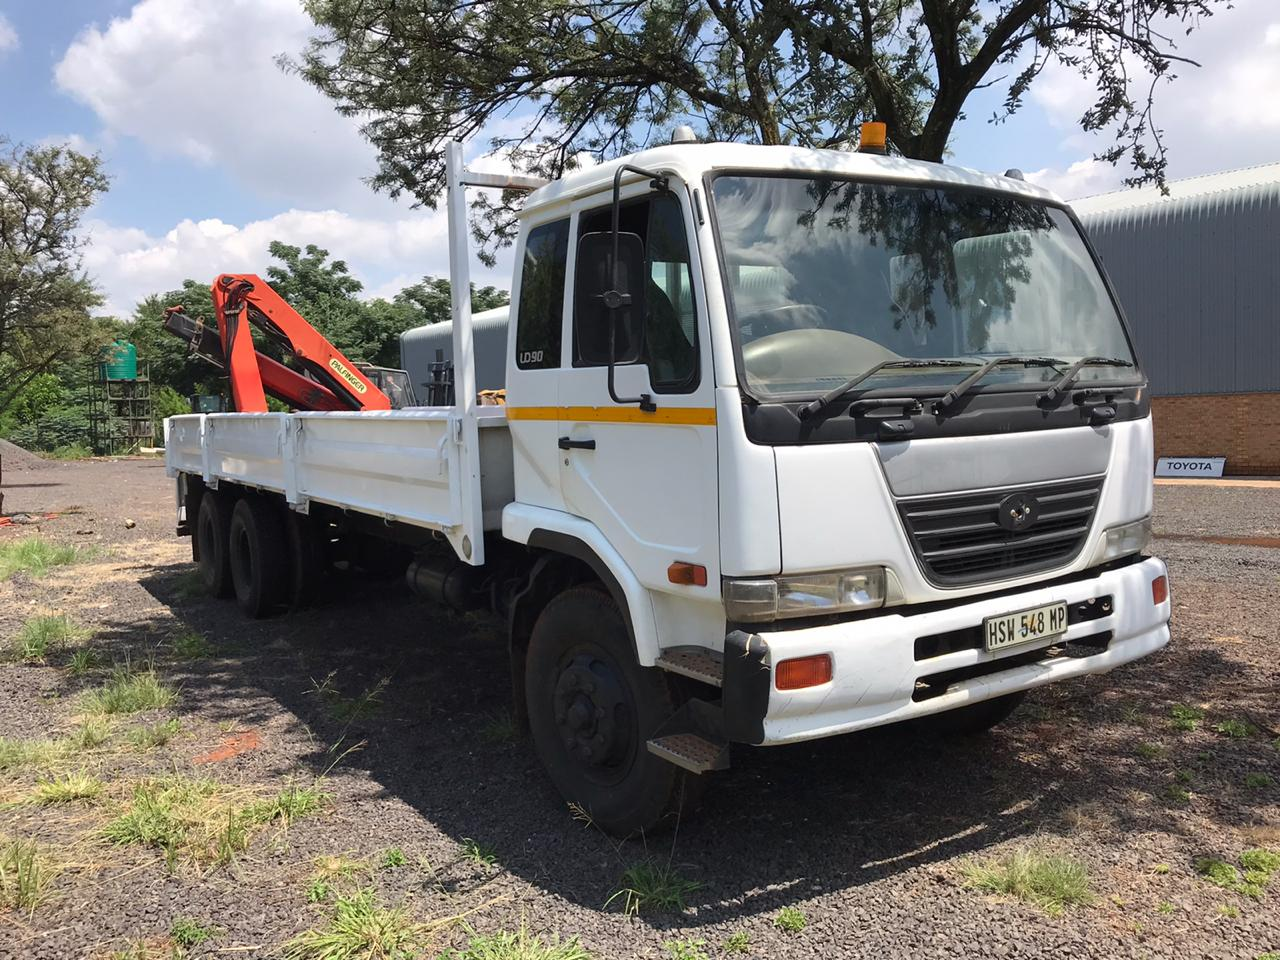 Nissan UD 90 Crane Truck